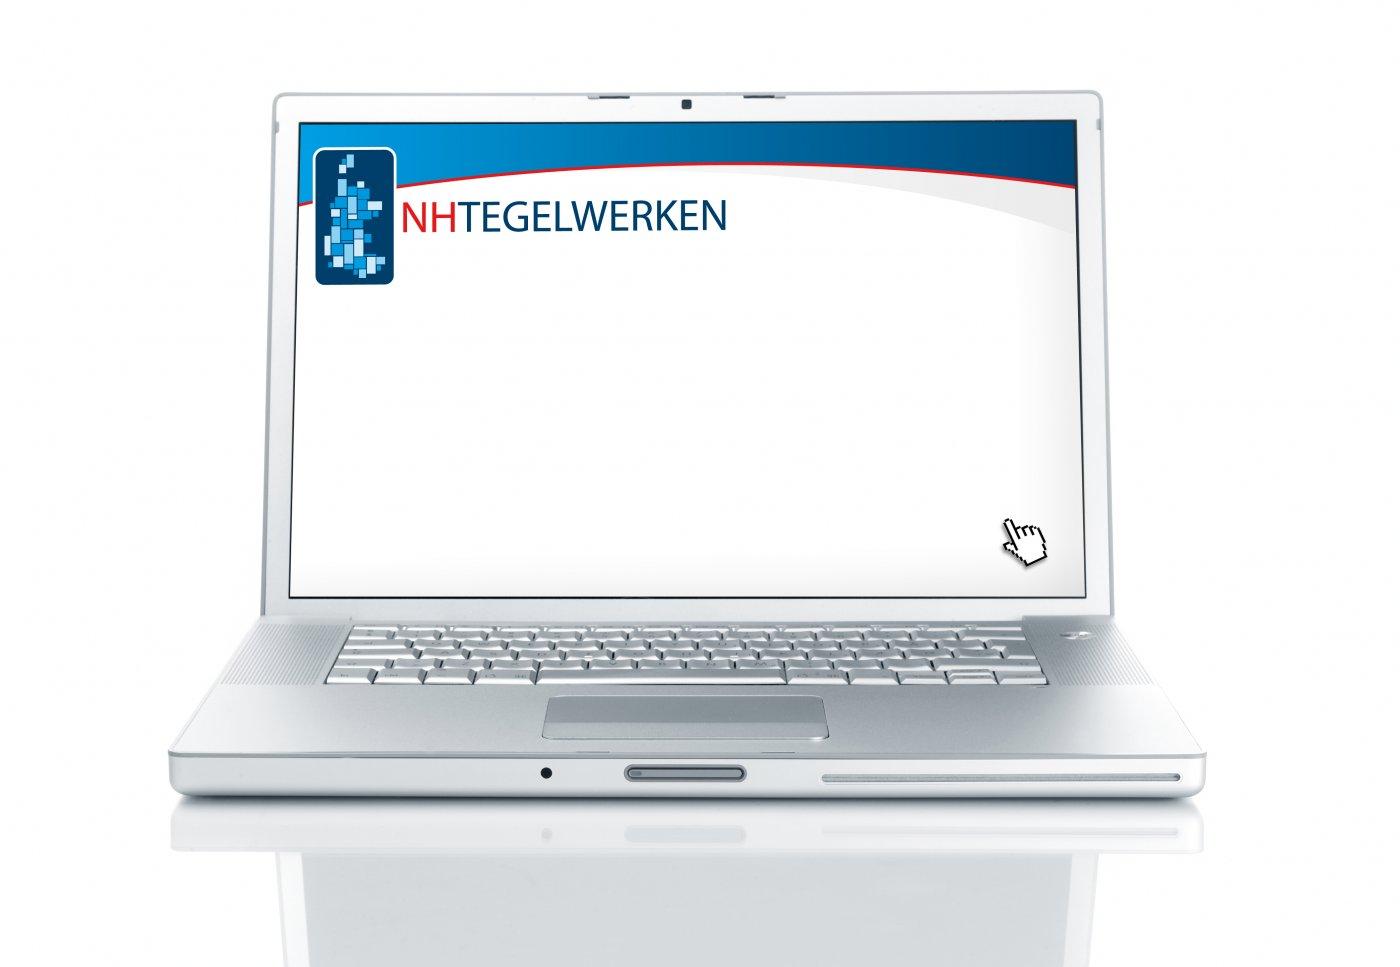 Logo NH tegelwerken